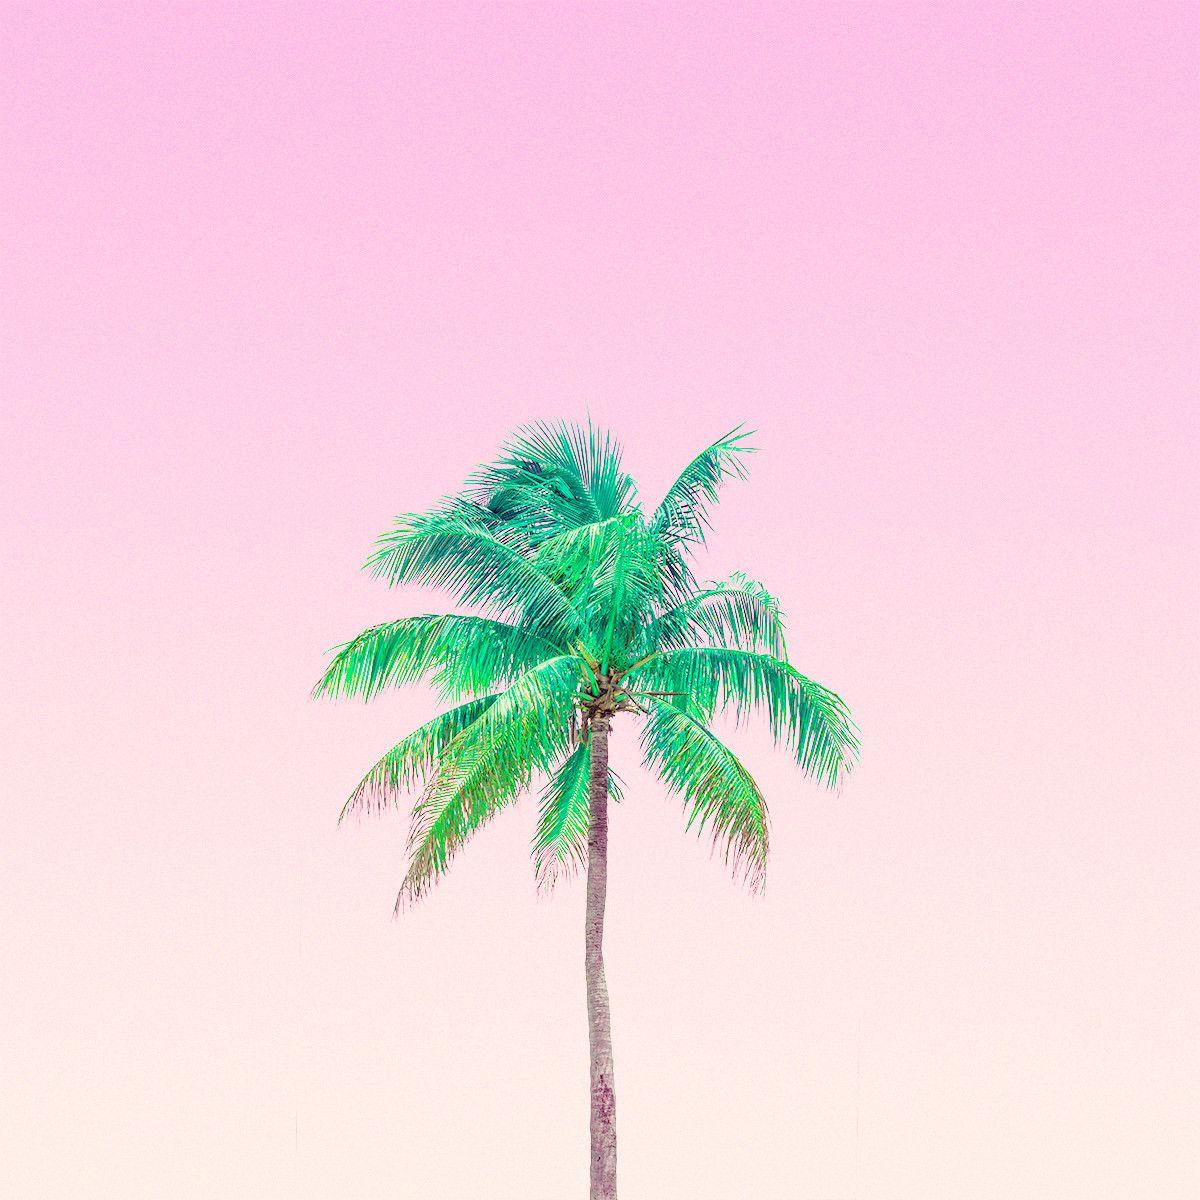 Tree Wallpaper Iphone, Summer Wallpaper